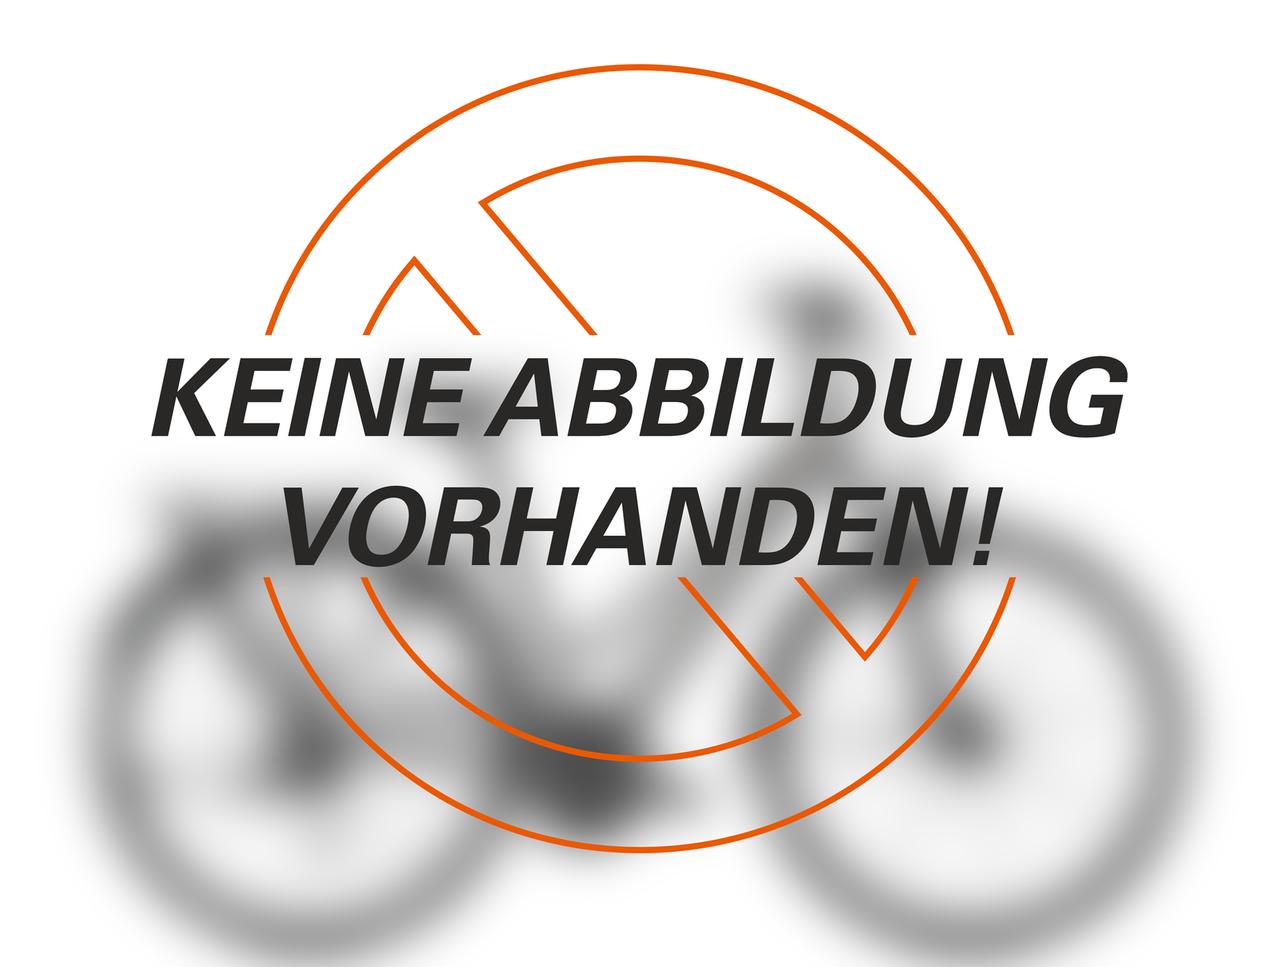 Kreidler Vitality Eco6 Edition Simano XT 10 Gang Bosch Performance CX 500W 36V 13,8Ah Freilauf – Bild 2